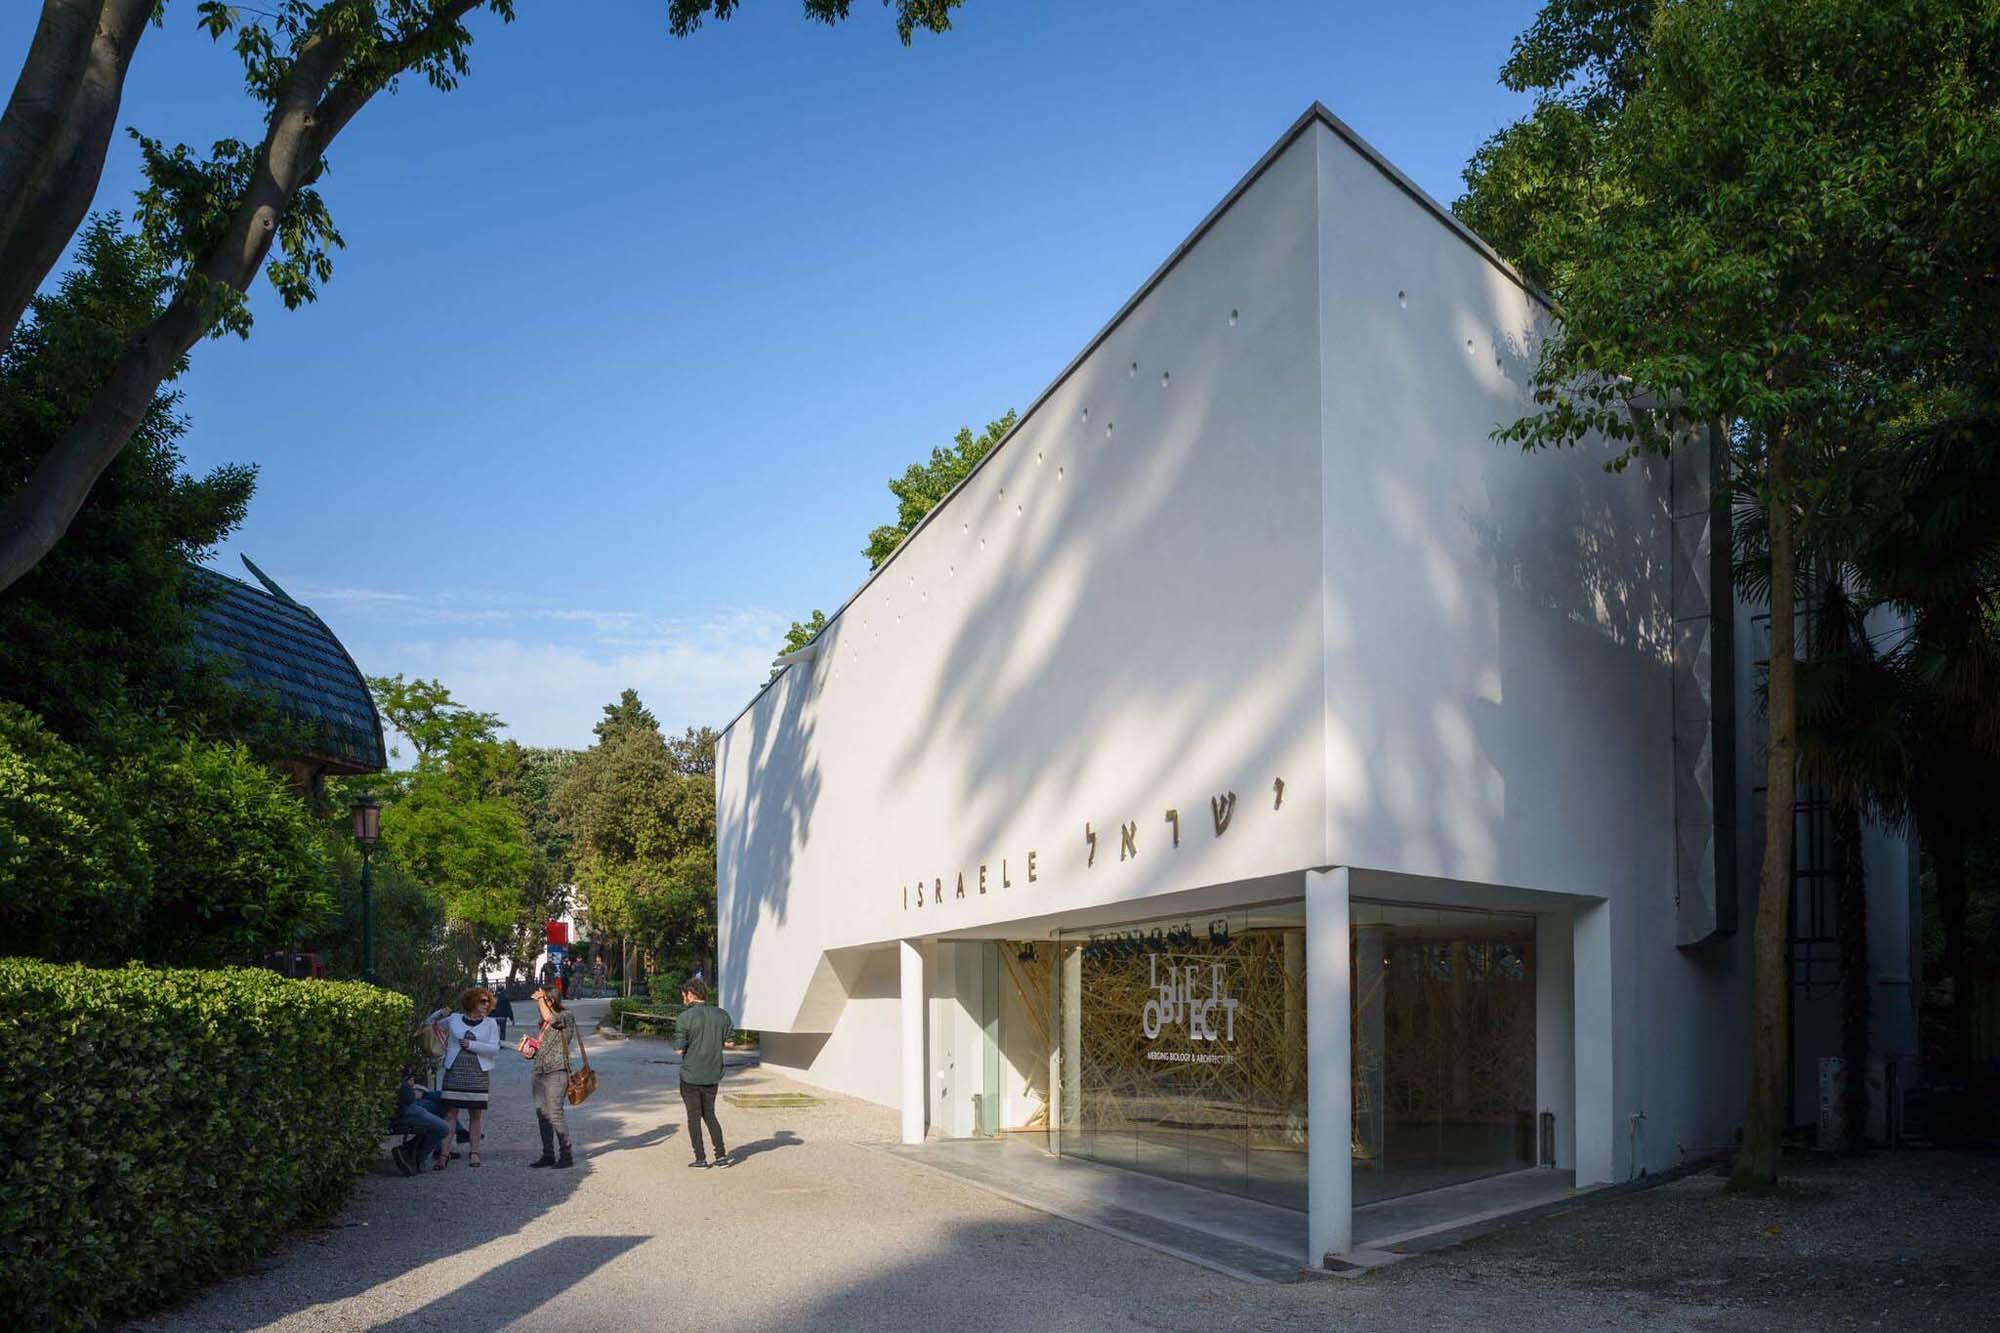 2016 Venice Biennale Israel Pavilion Lifeobject